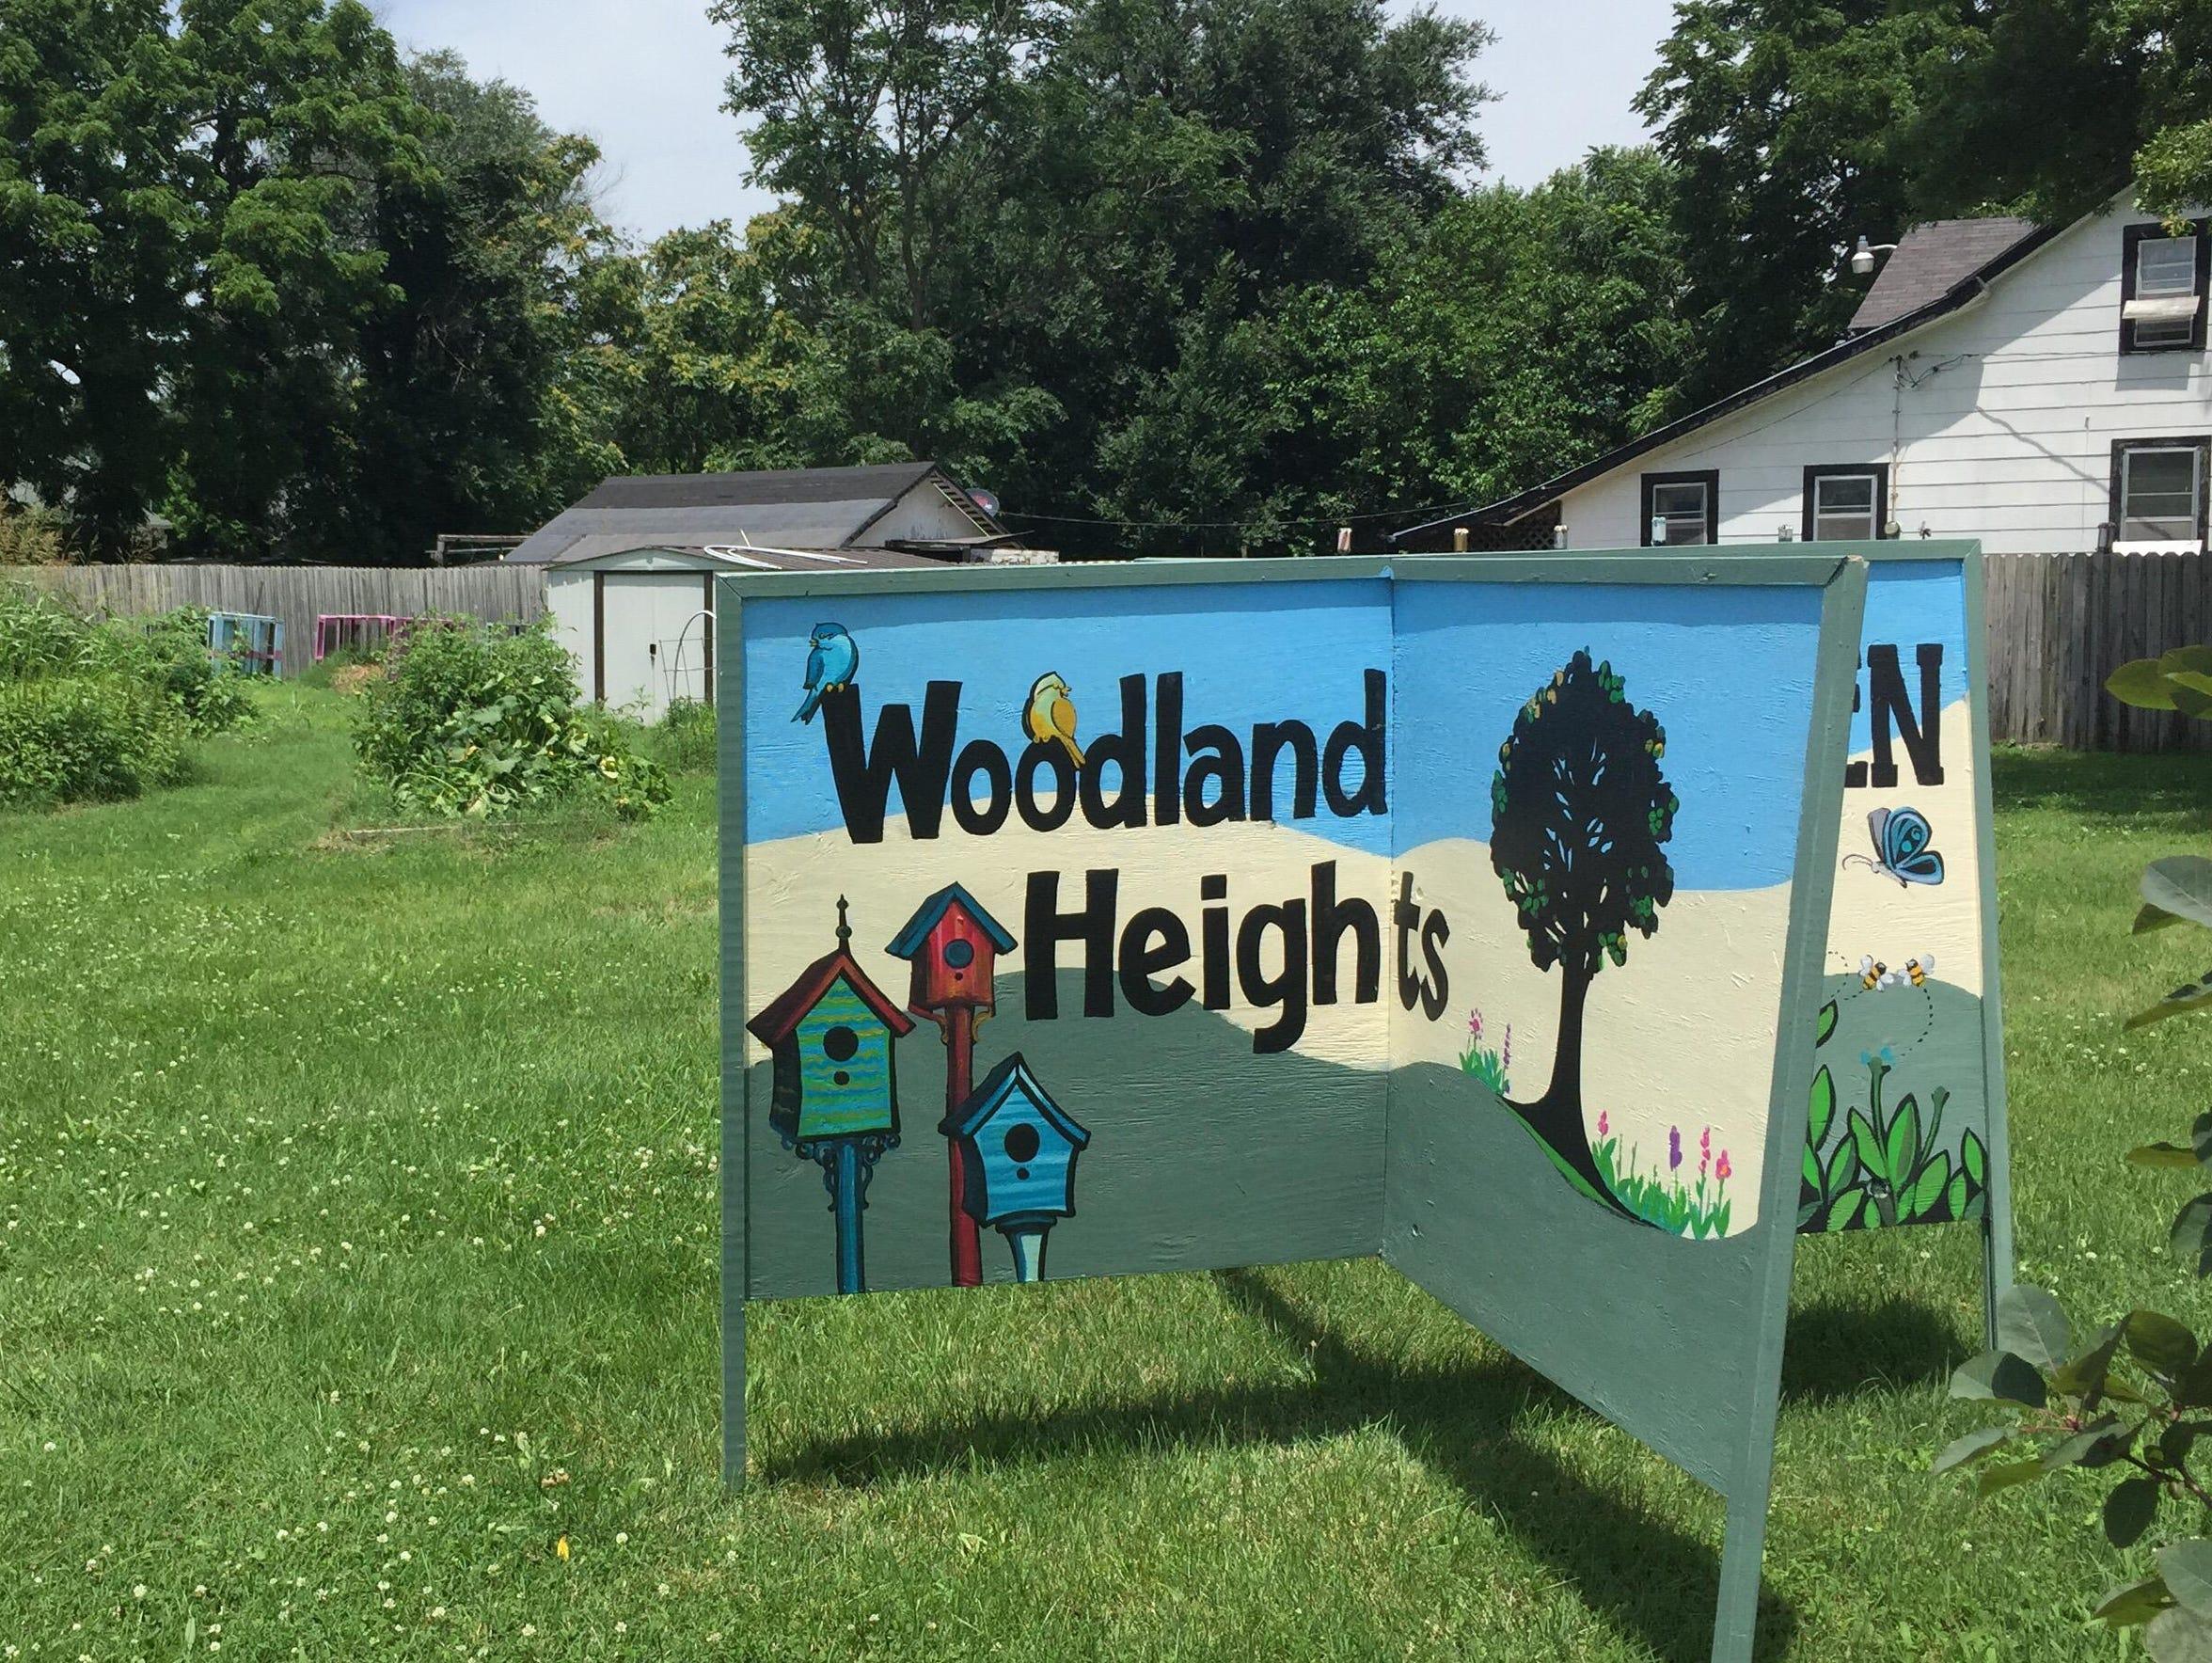 The Woodland Heights neighborhood has started a community